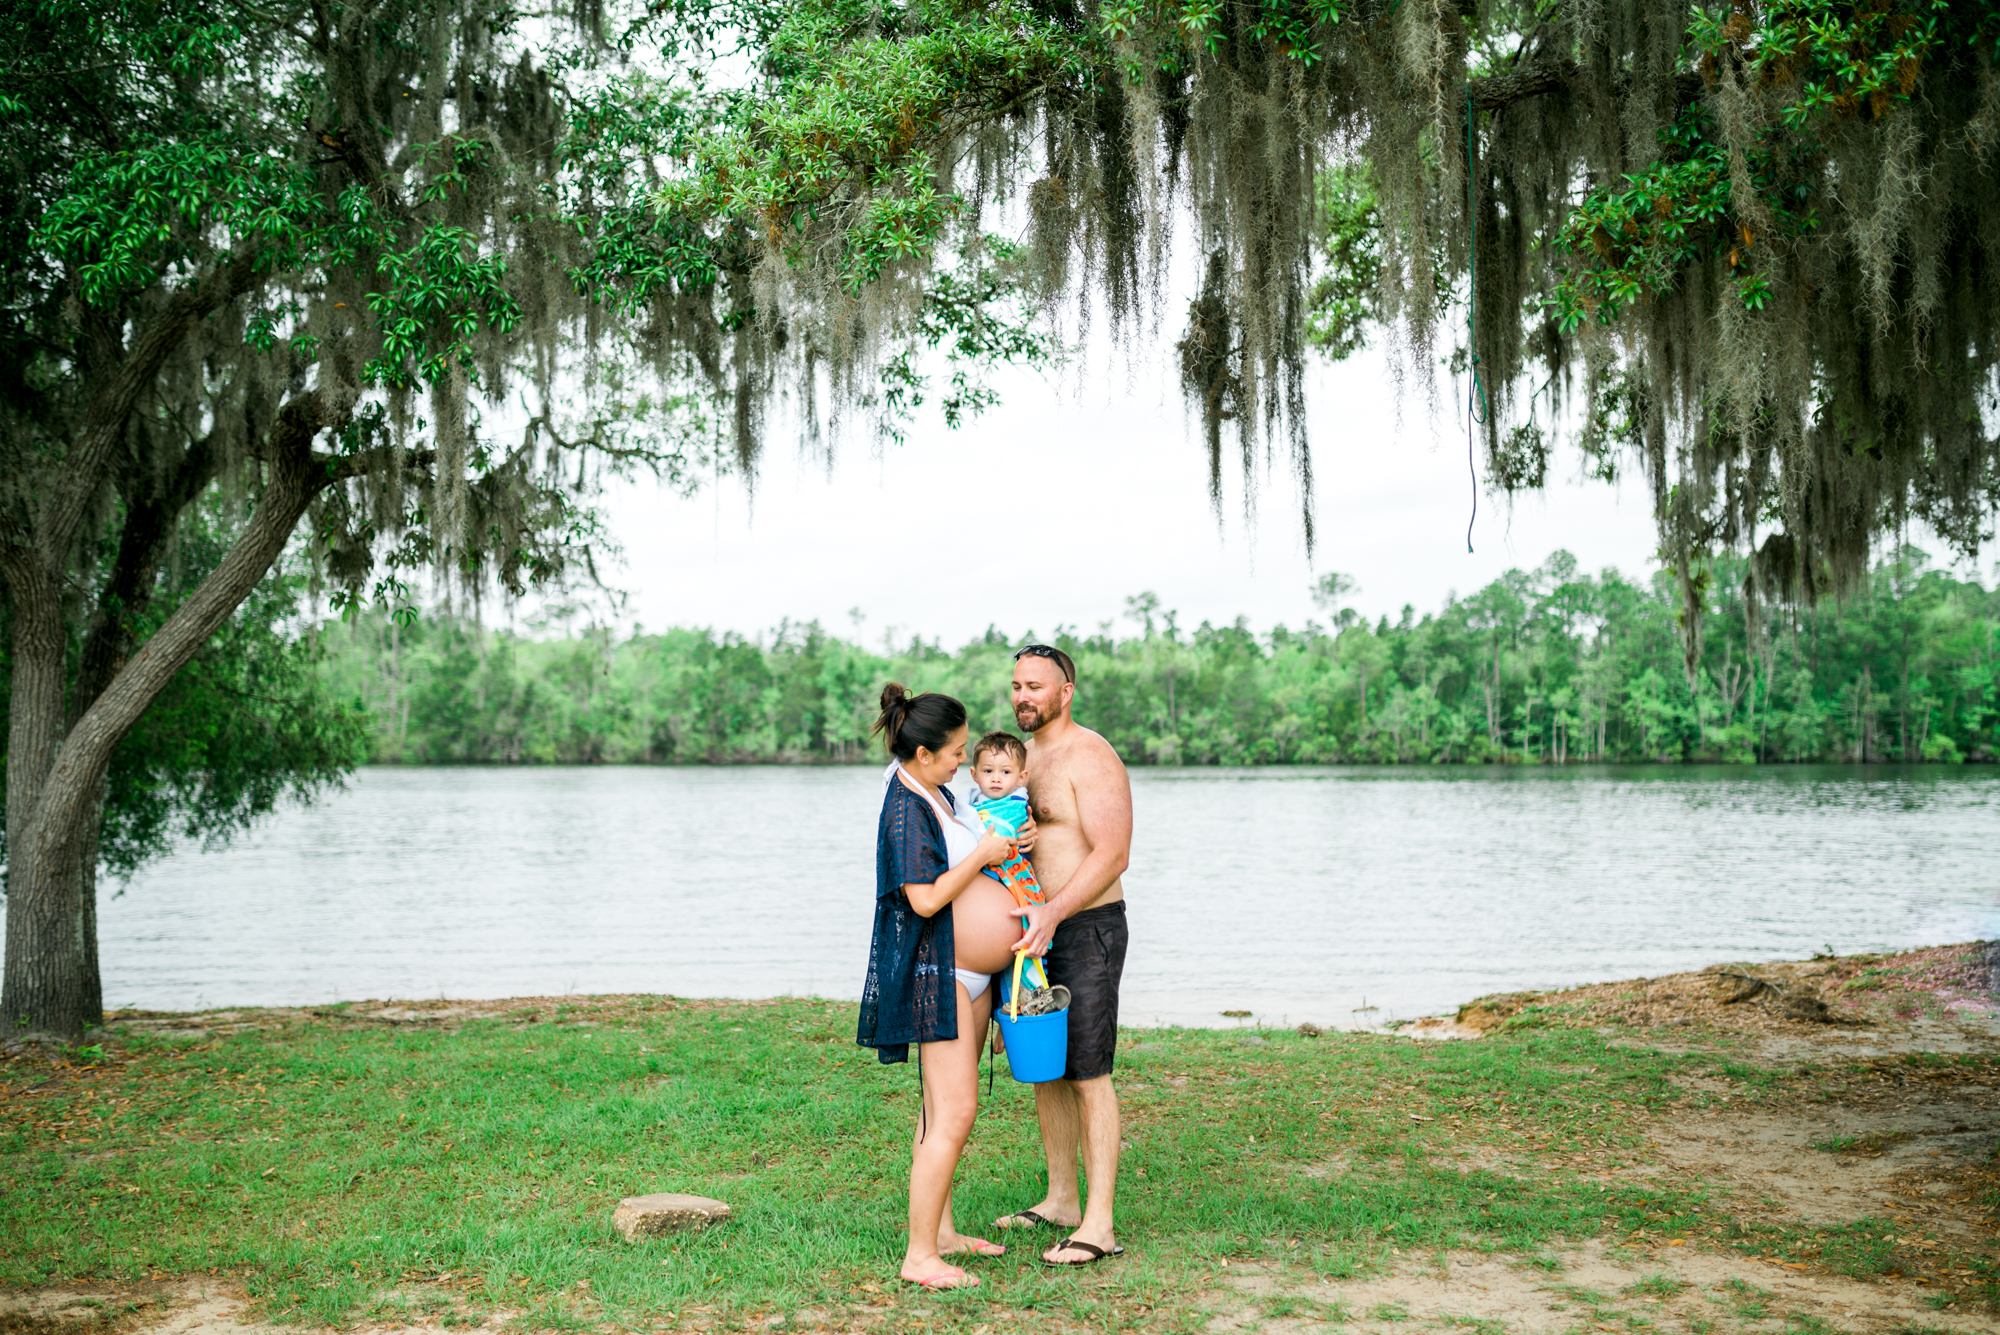 160430- Roughton Maternity_Family Lifestyle-771.jpg